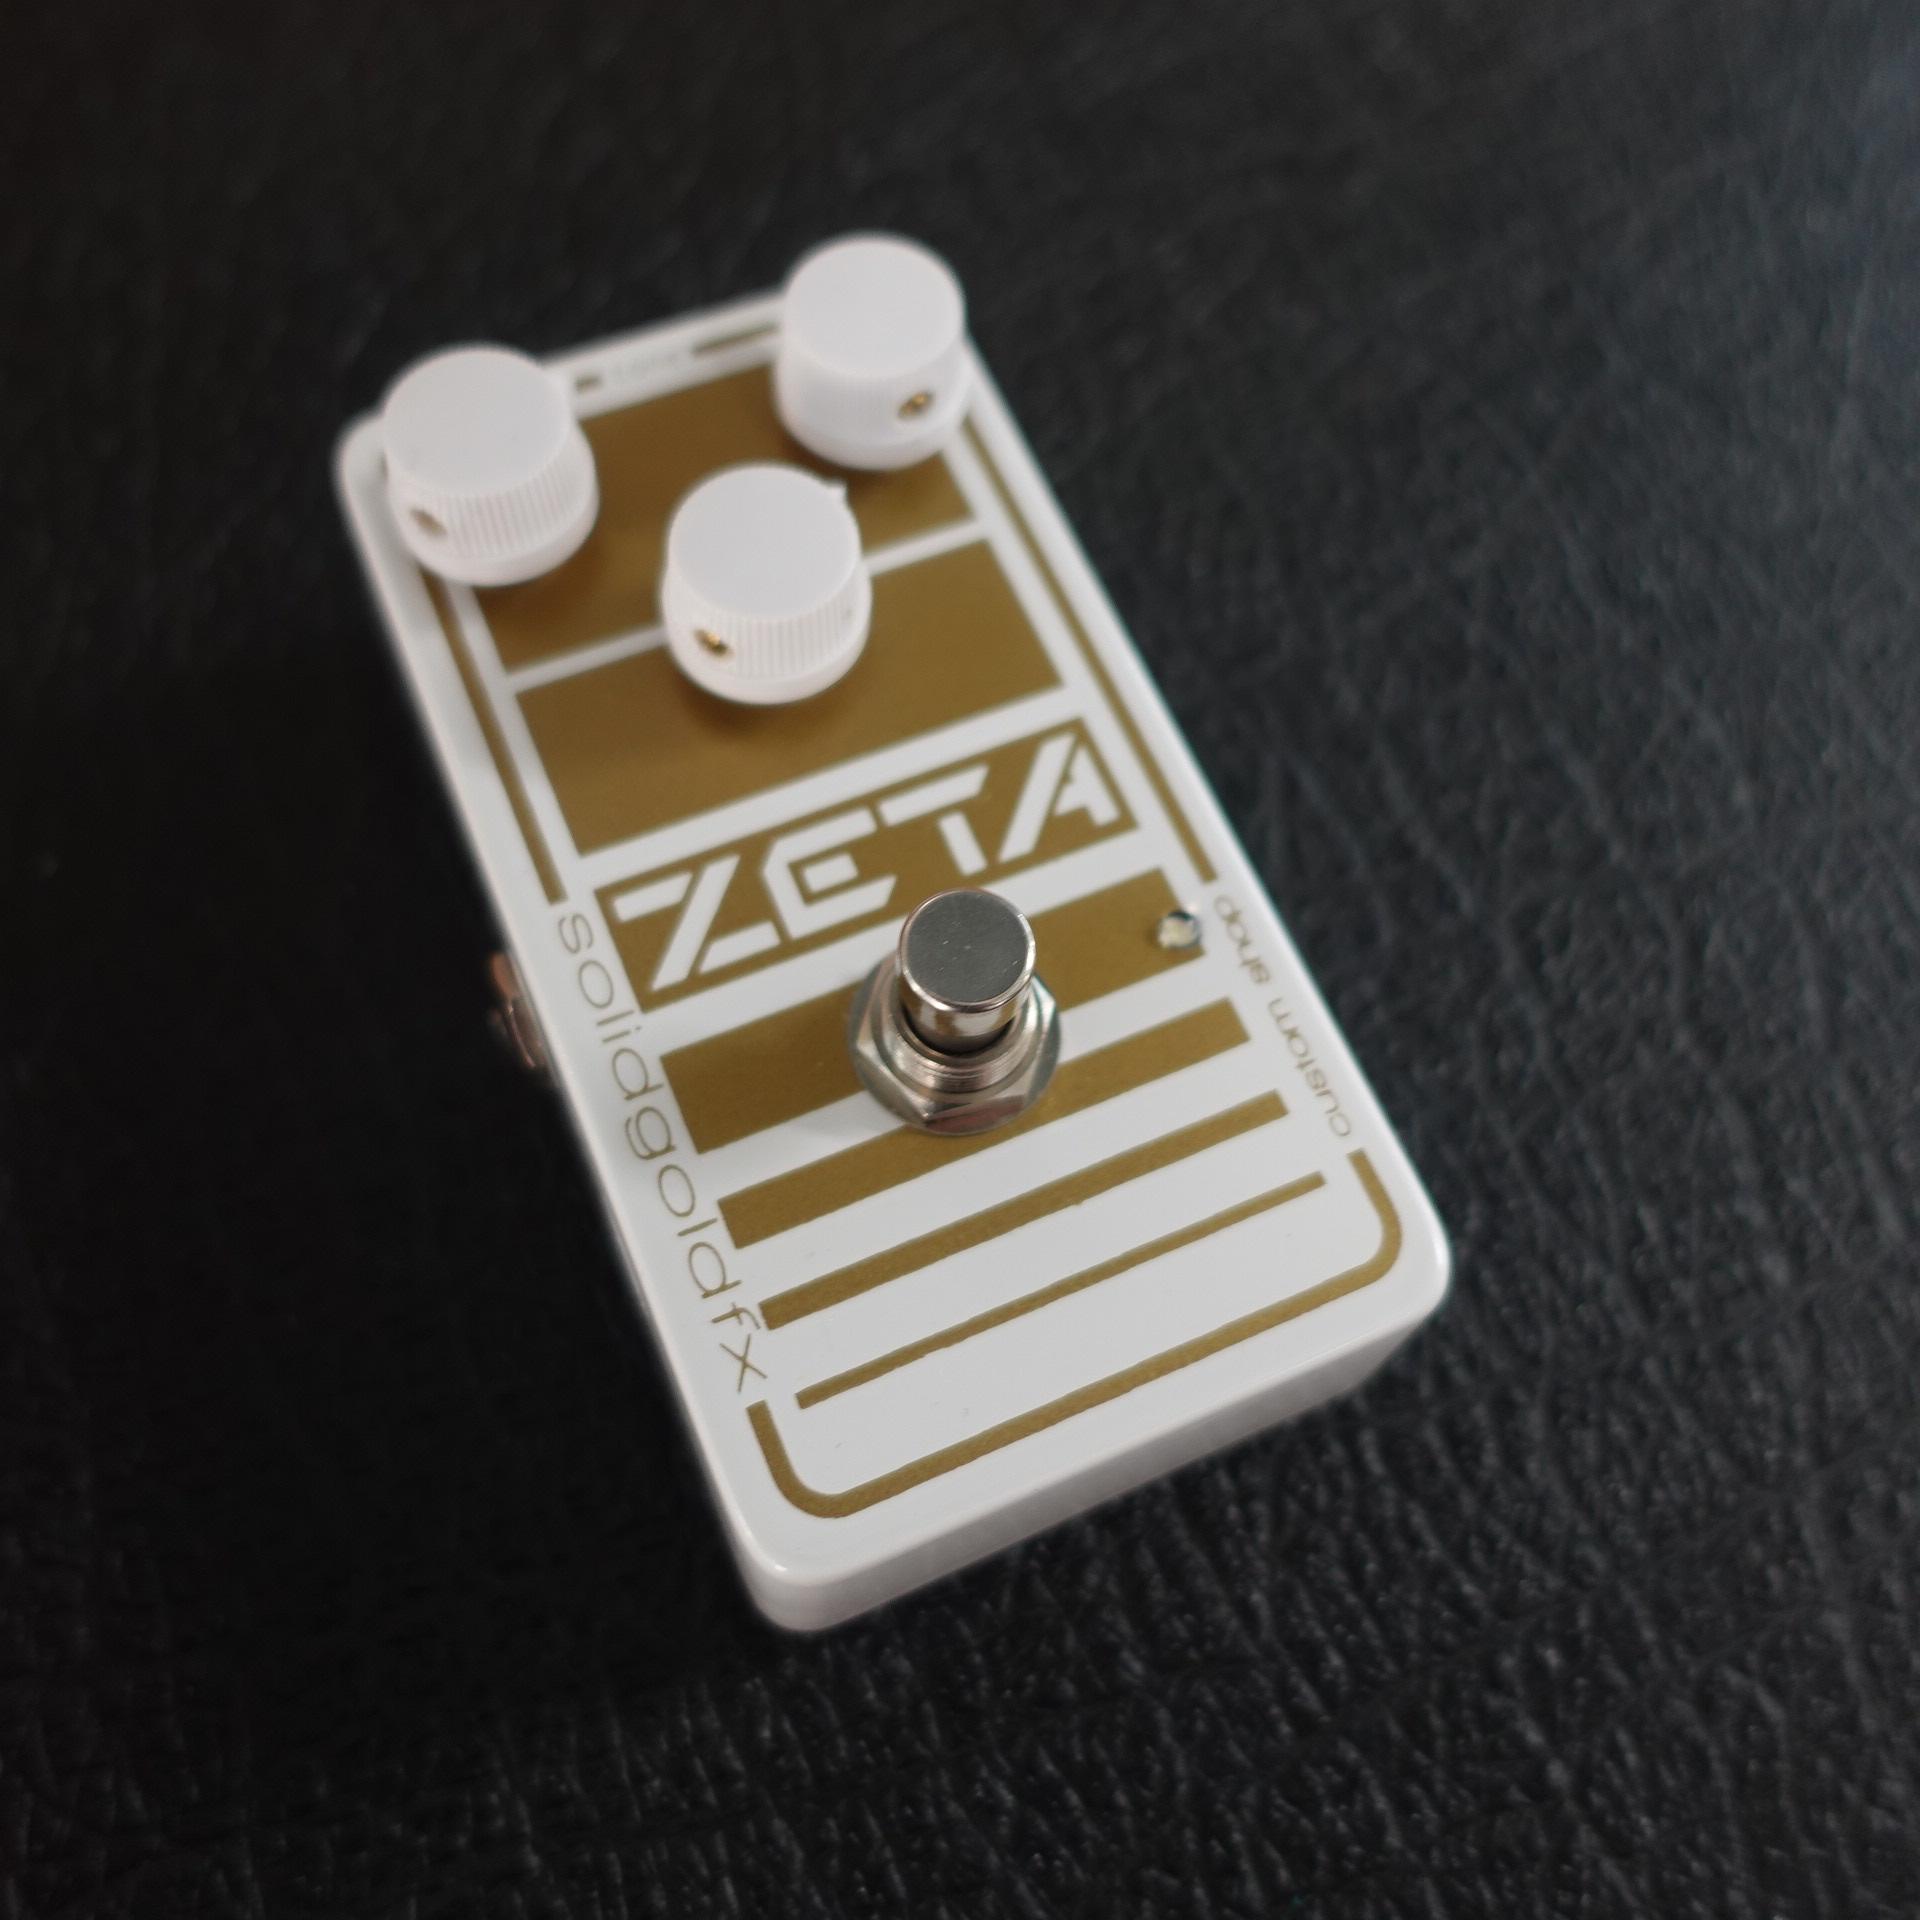 Solid Gold FX Zeta Gold